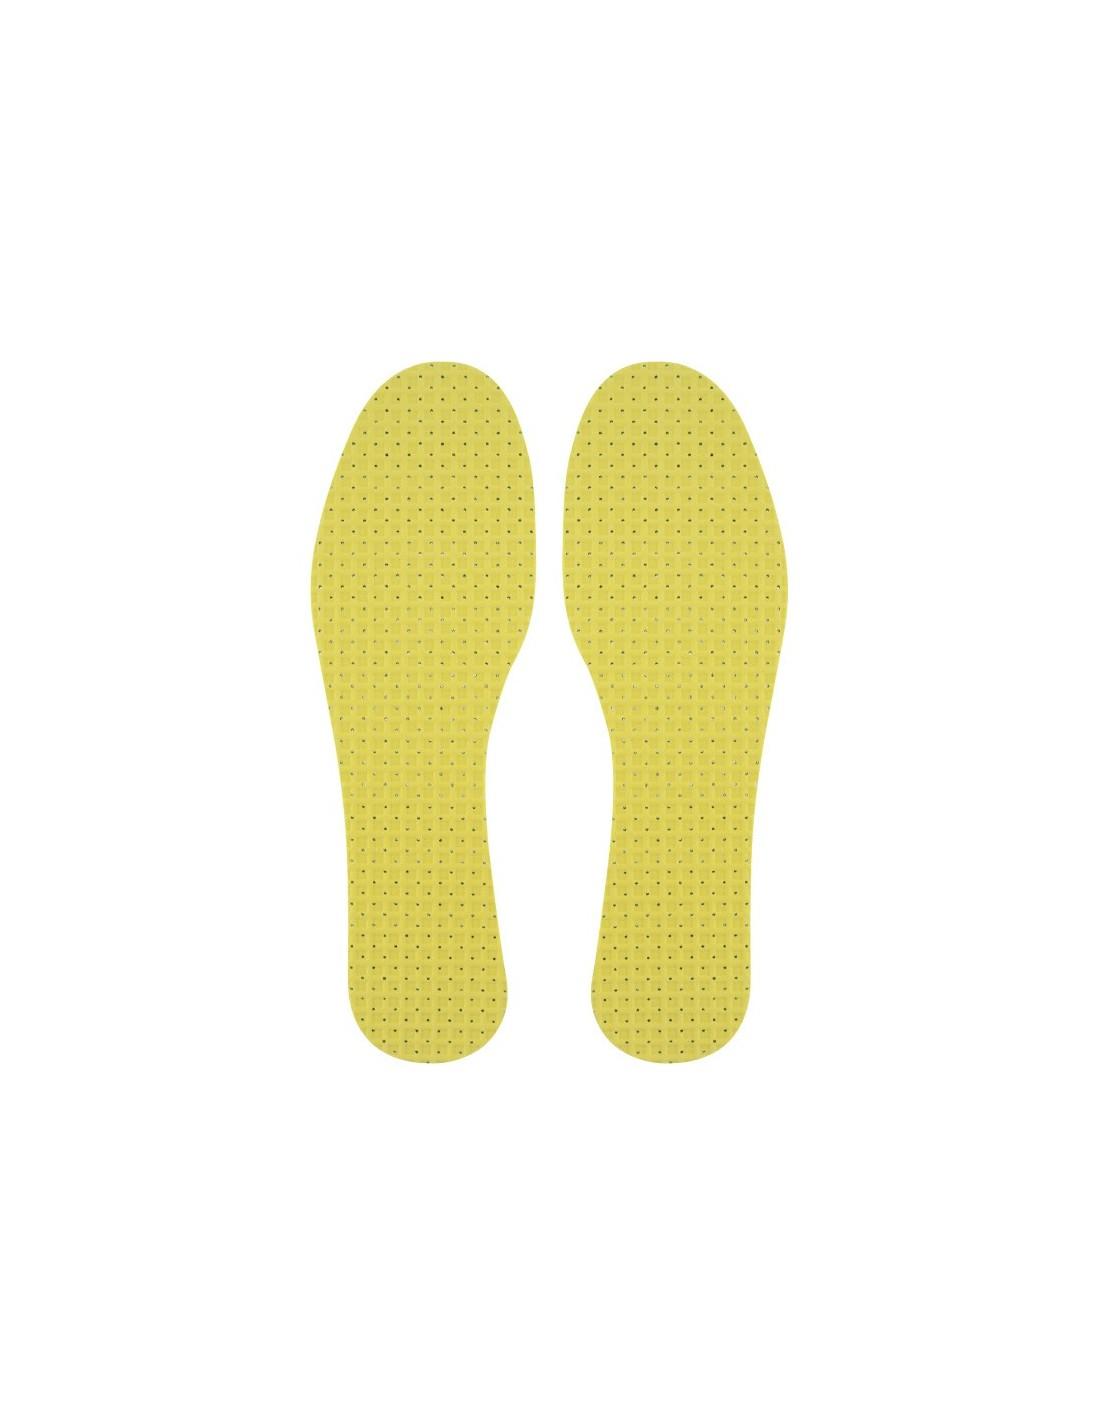 lowest price 9ddd9 a295d Solette scarpe profumate alla vaniglia per scarpe 2 pz